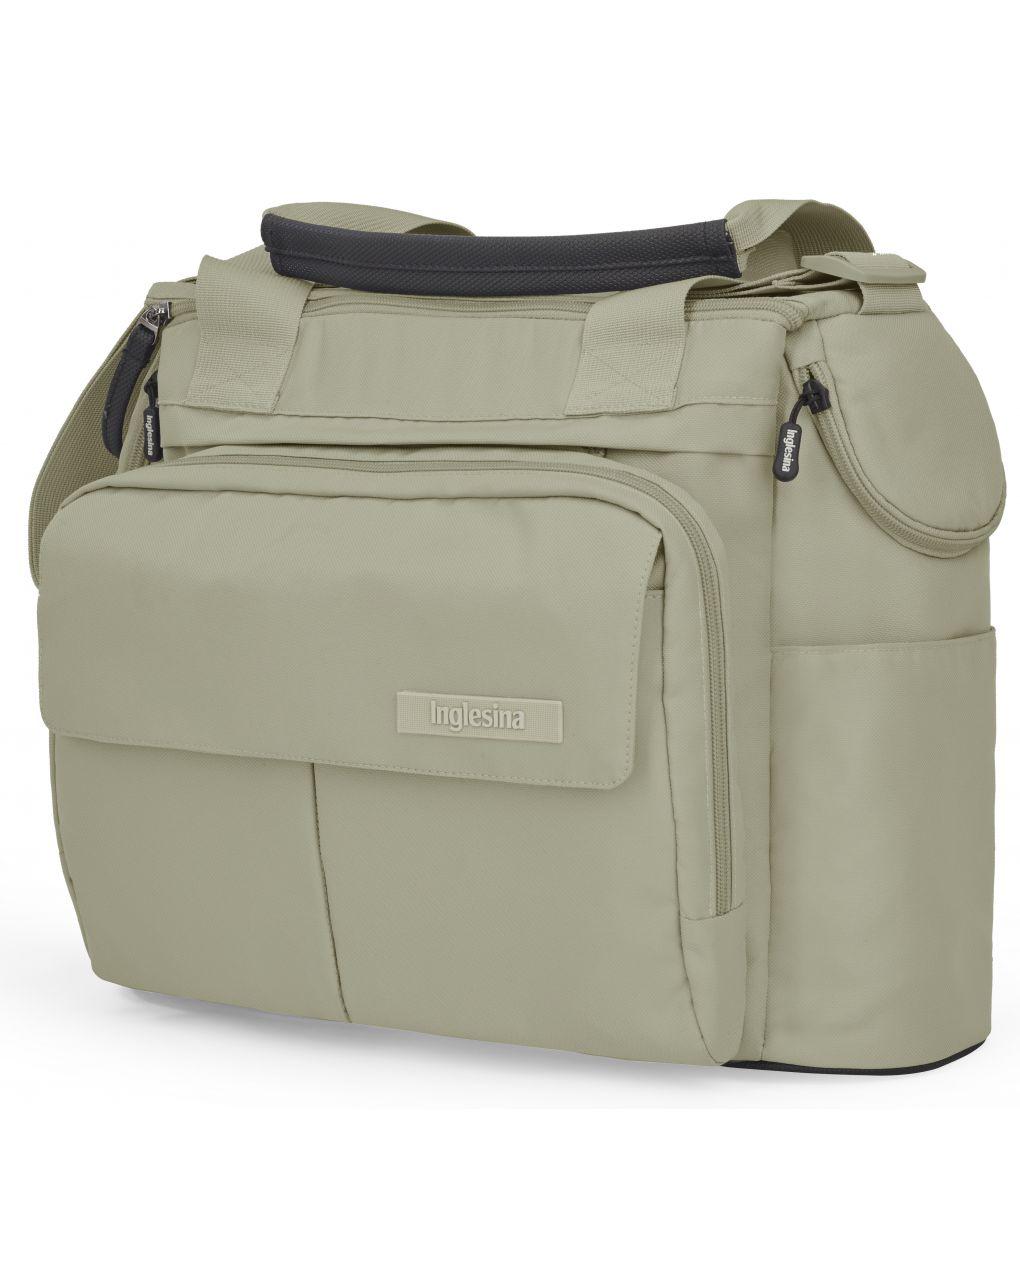 Inglesina Dual Bag Electa - Nolita - Μπεζ